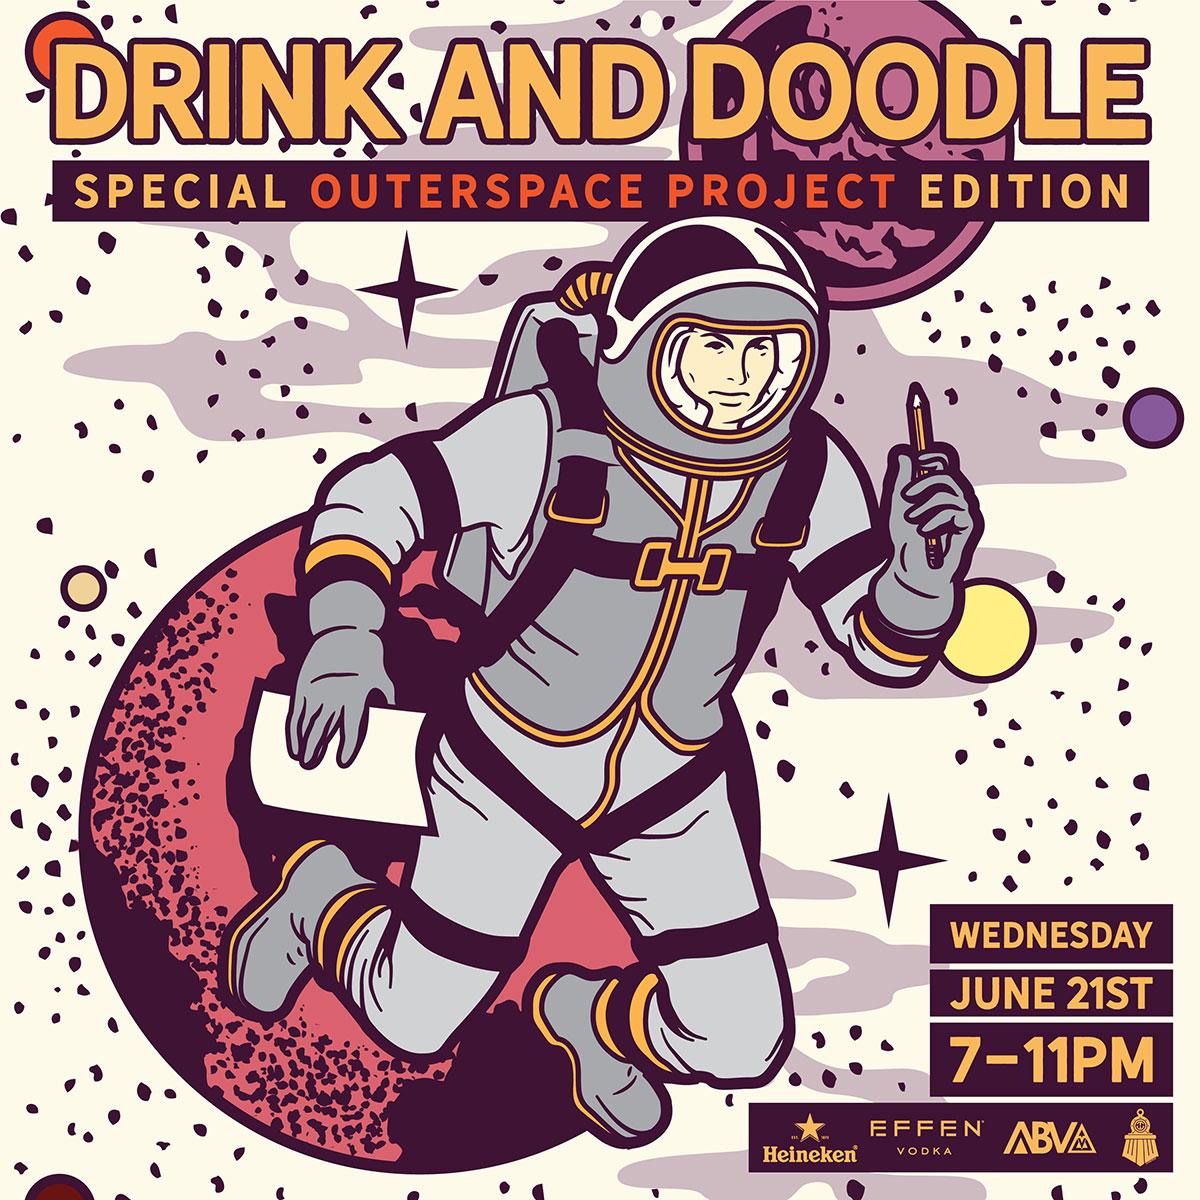 DRINK_AND_DOODLE_OSP_20217-web.jpg